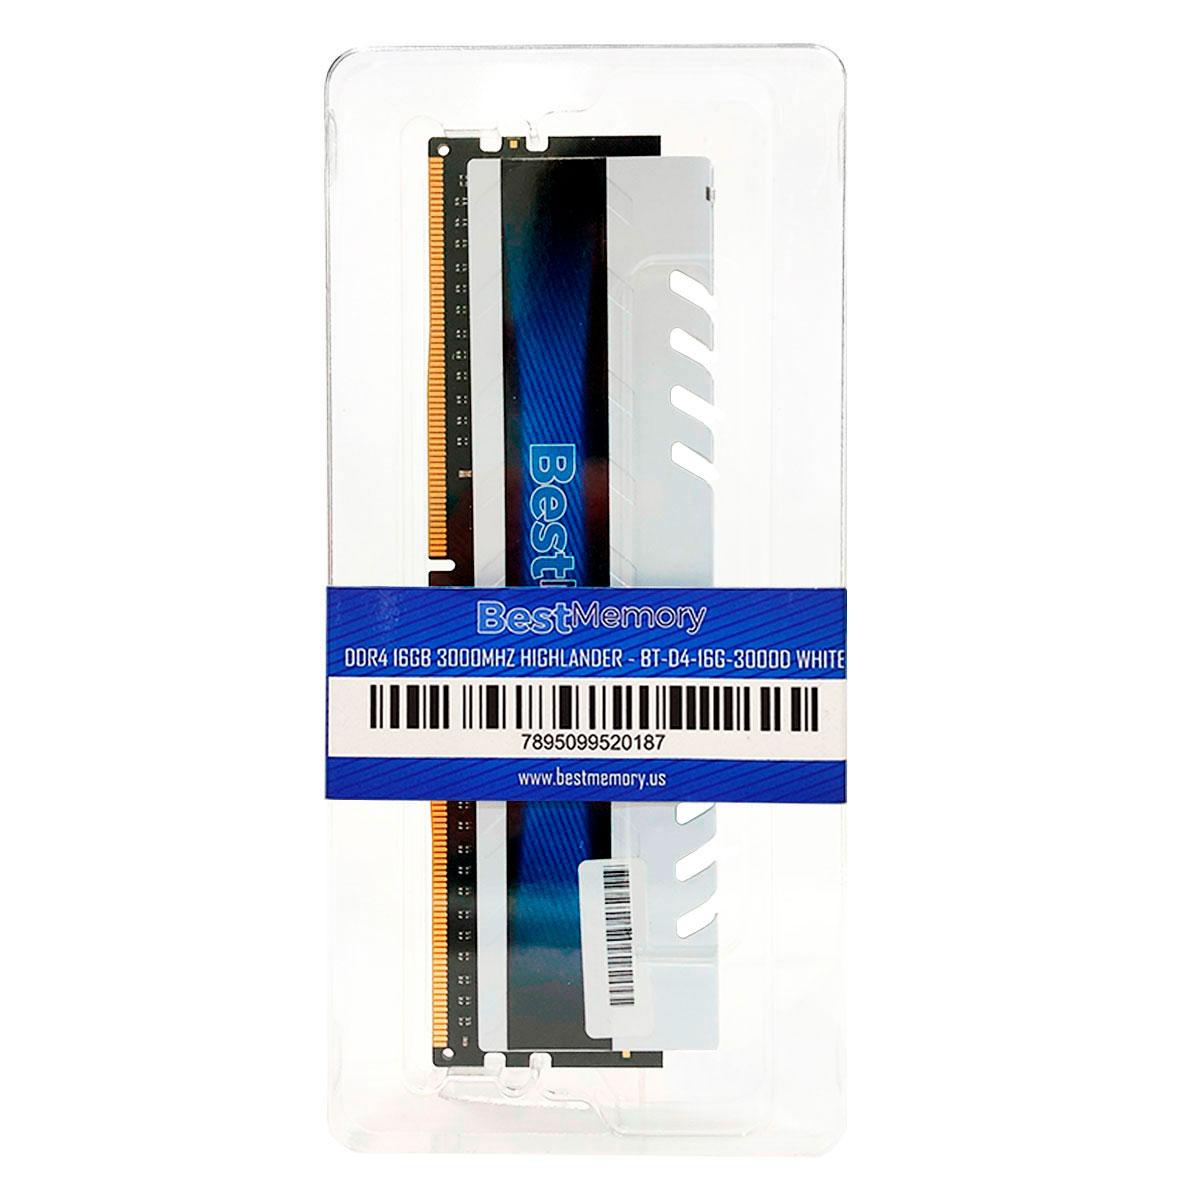 Memória Gamer 16GB Best Memory Highlander, DDR4, 3000MHz, CL15 - BT-04-16G-3000D White